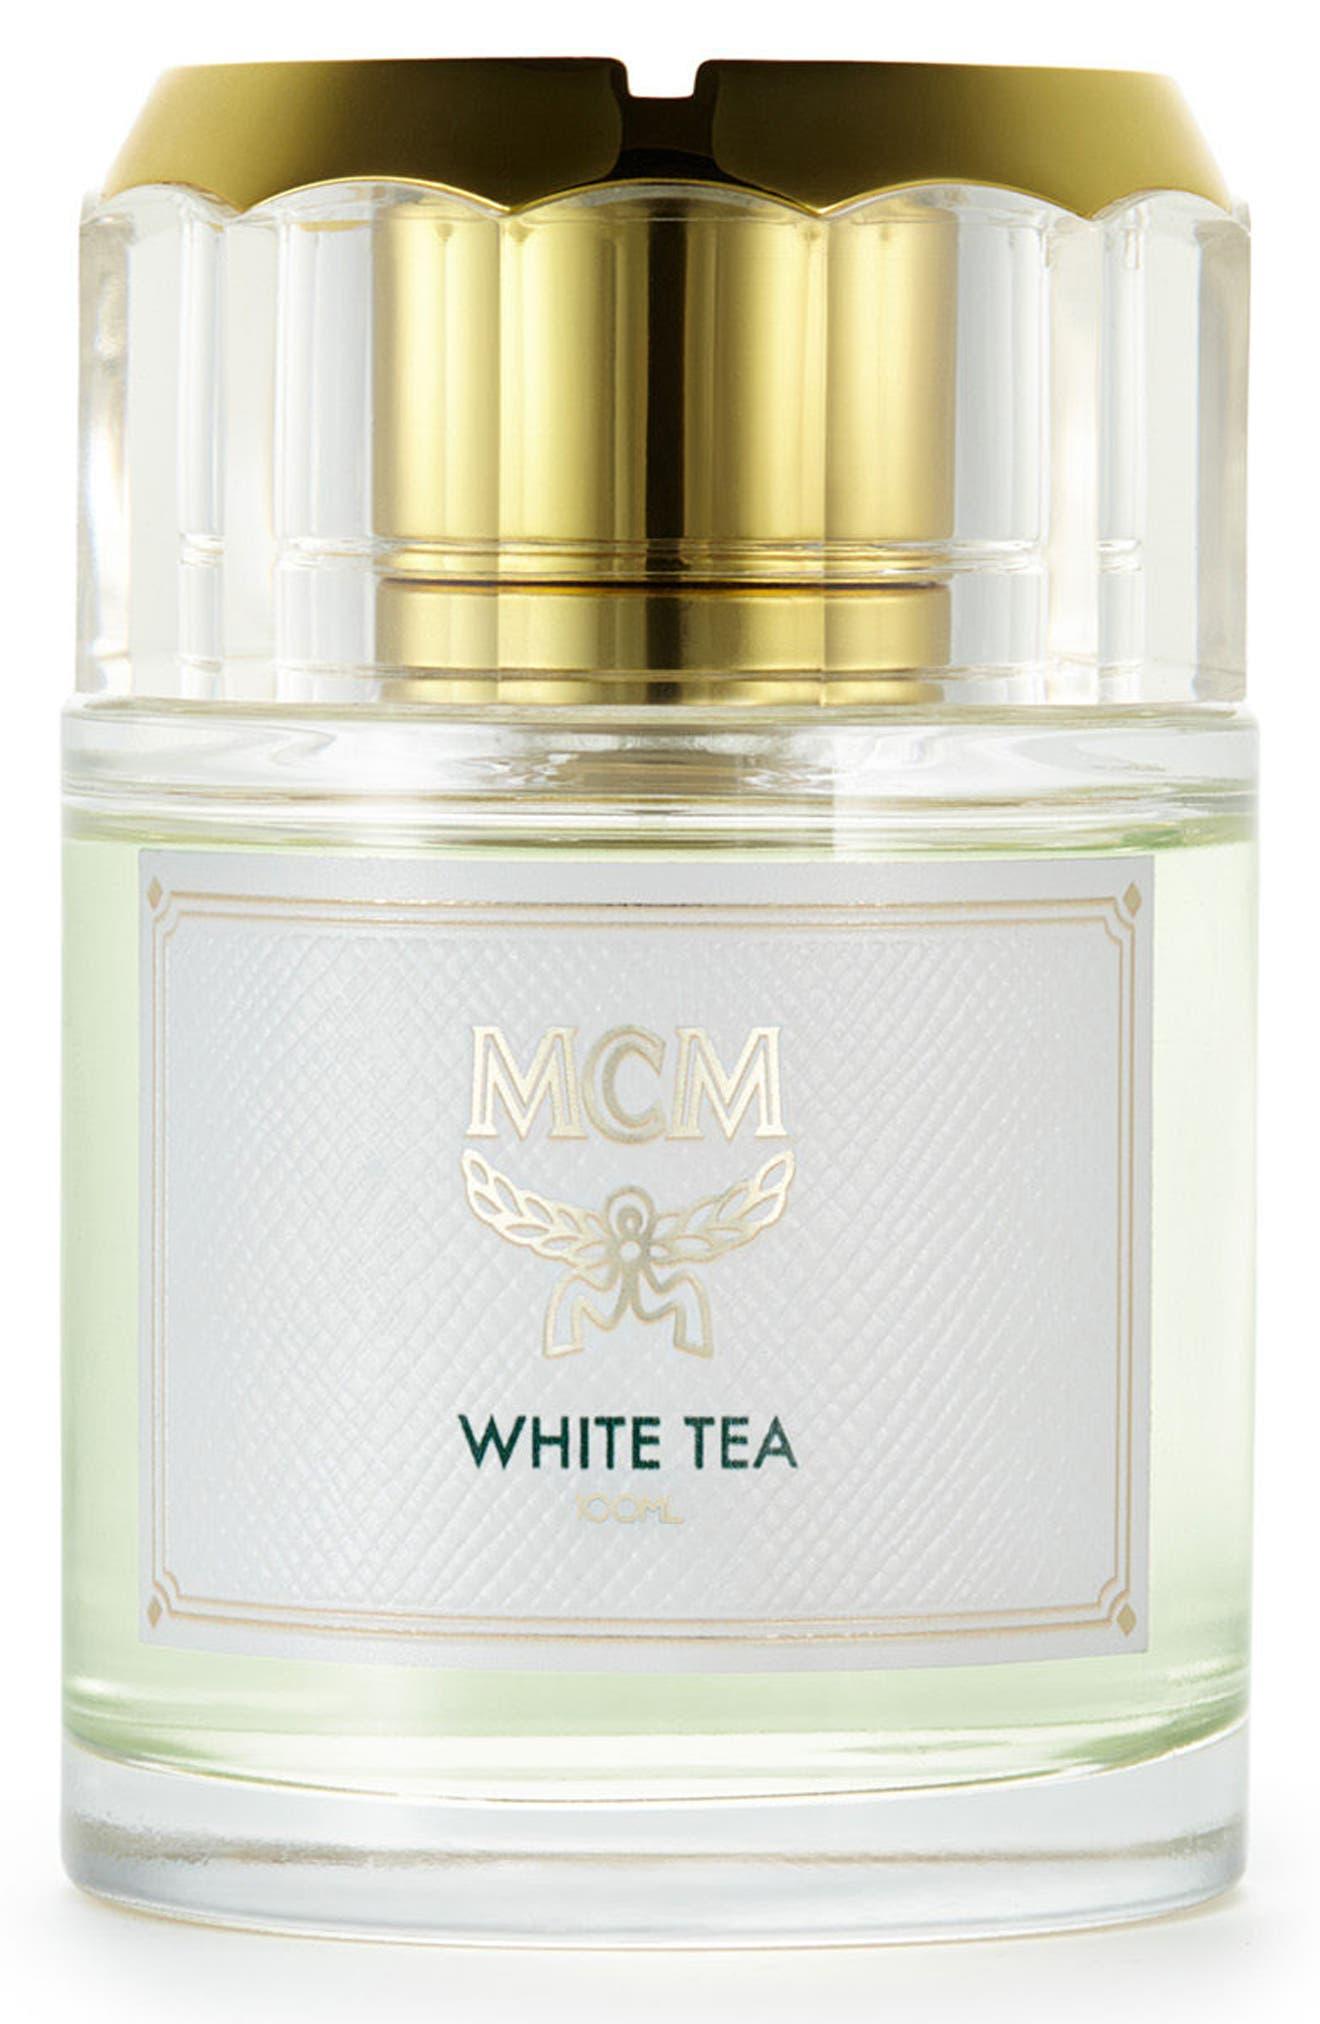 MCM White Tea Perfume